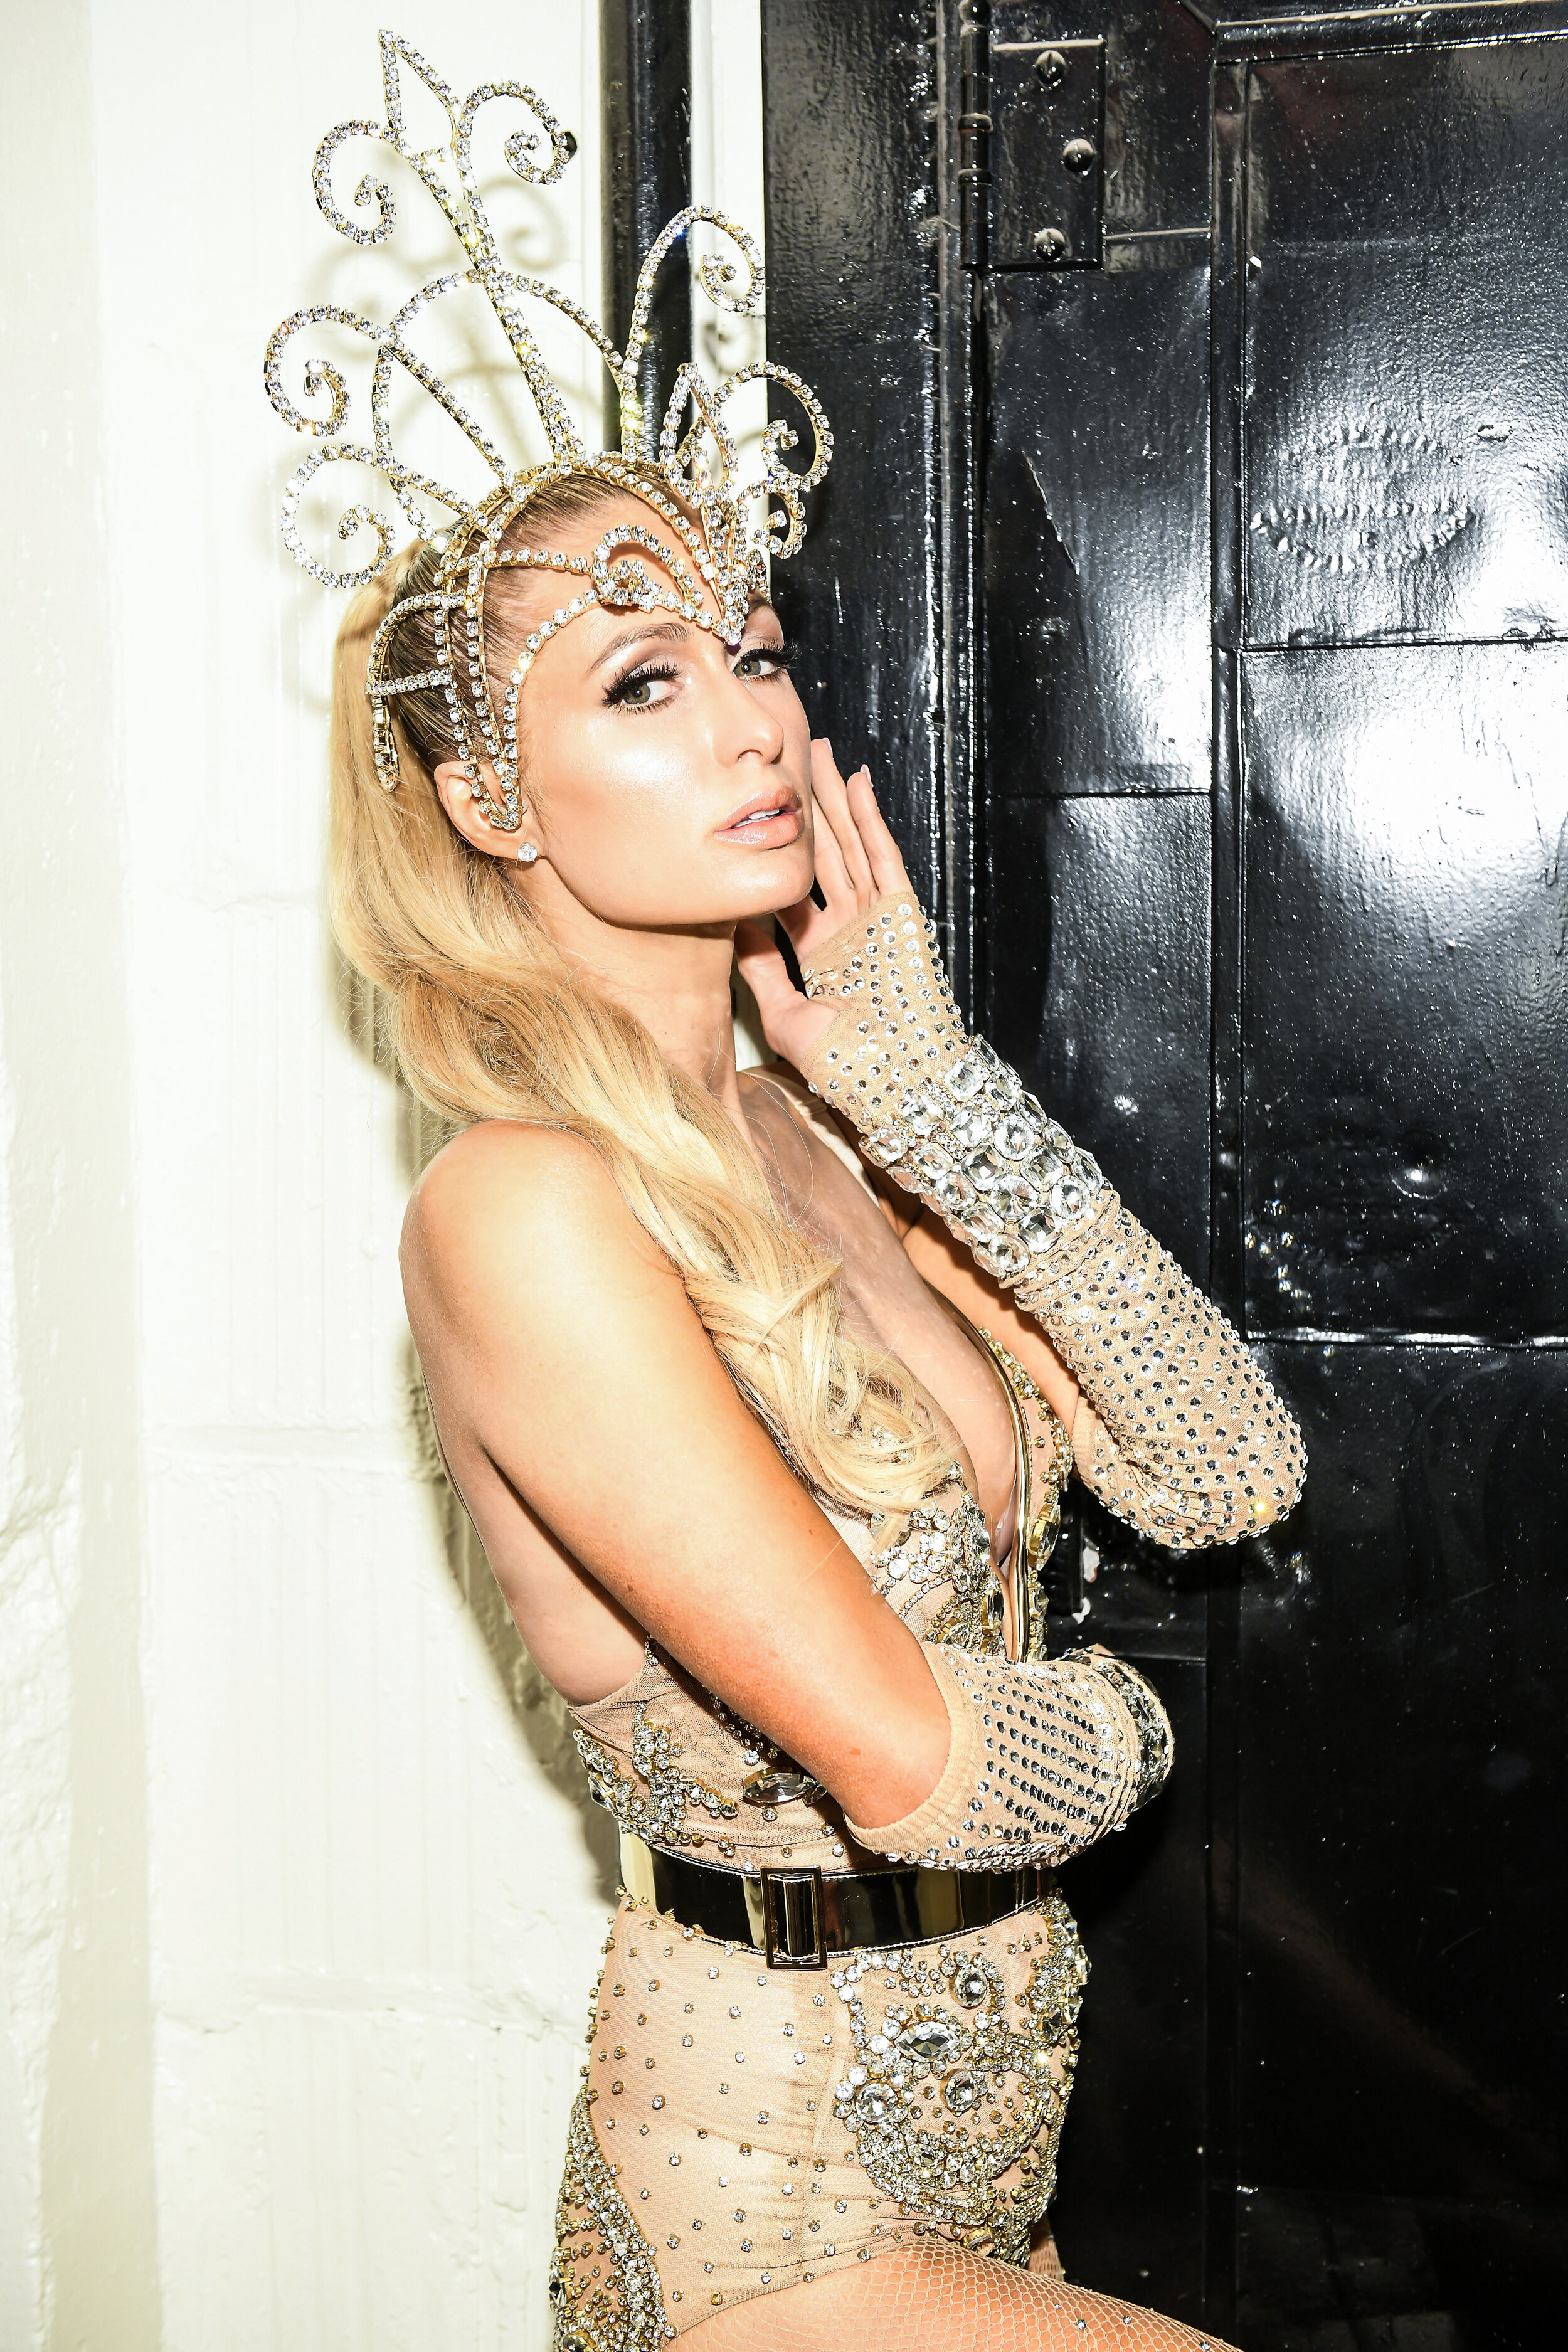 Paris Hilton by photographer Andrew Werner  9.9.19 .jpg